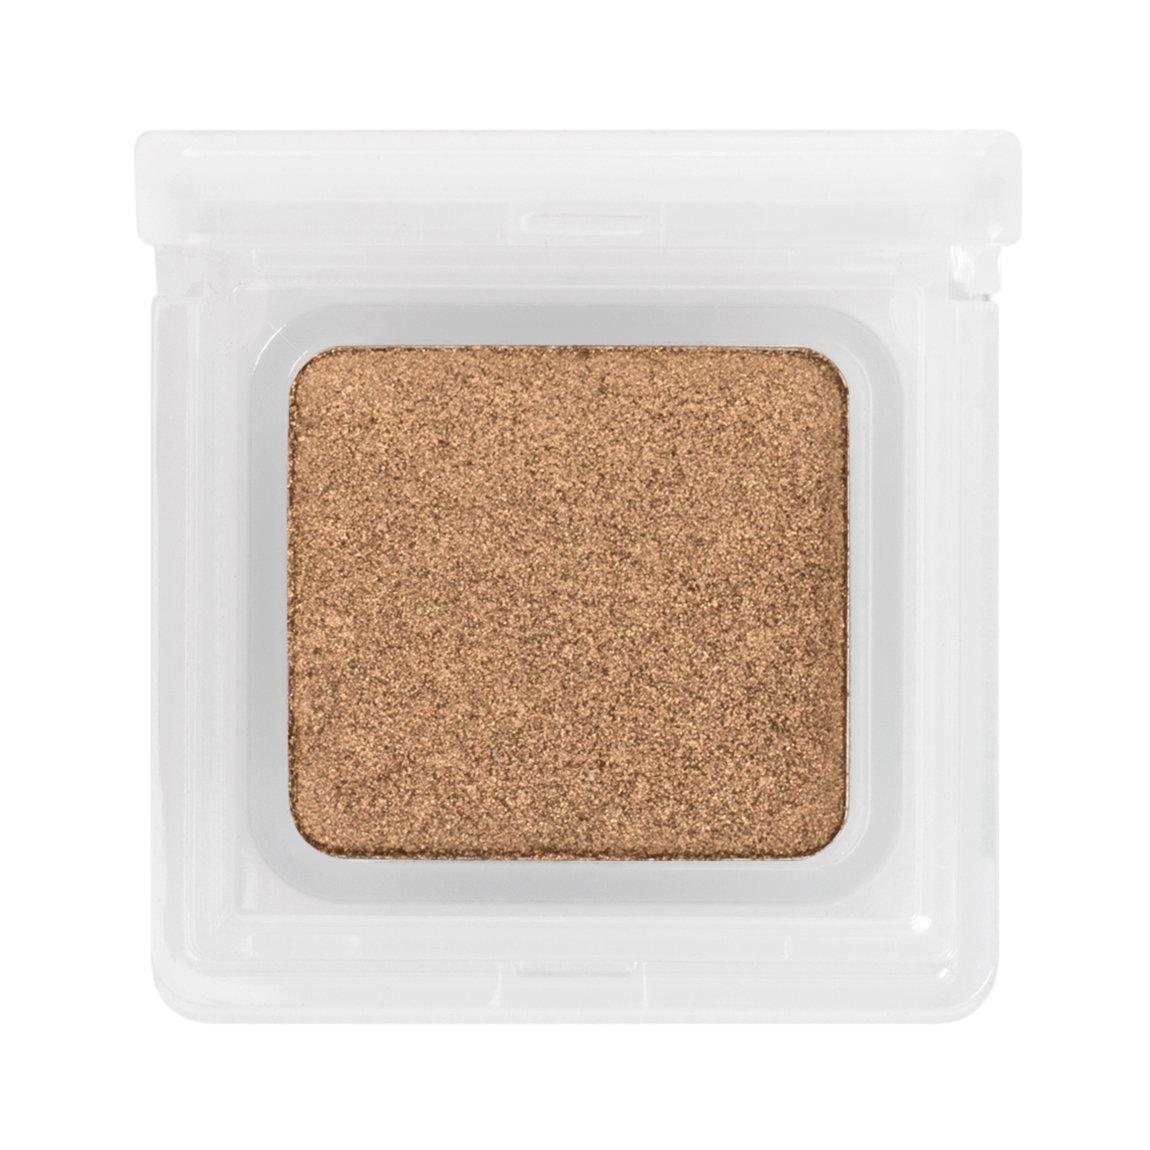 Natasha Denona Mono Eye Shadow Metallic 13M - Raw Gold alternative view 1 - product swatch.